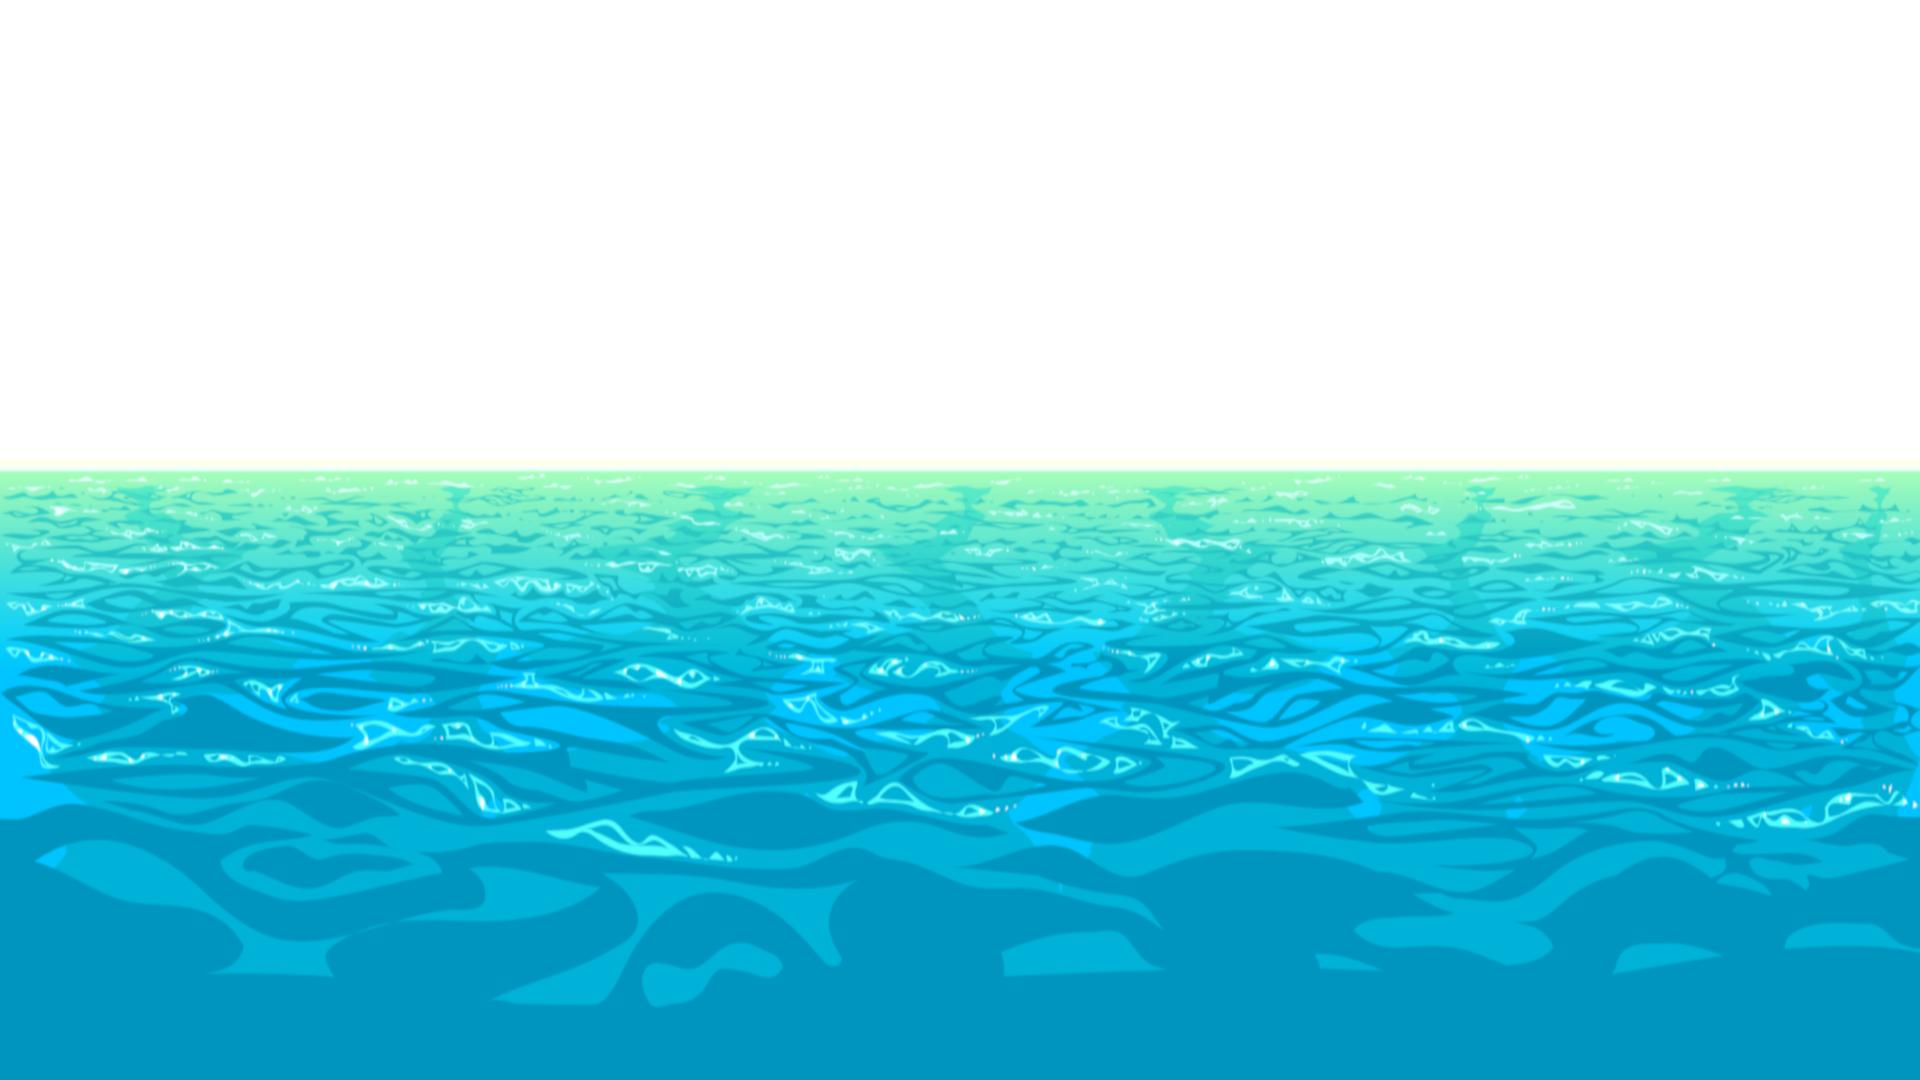 src/components/images/ocean2.png